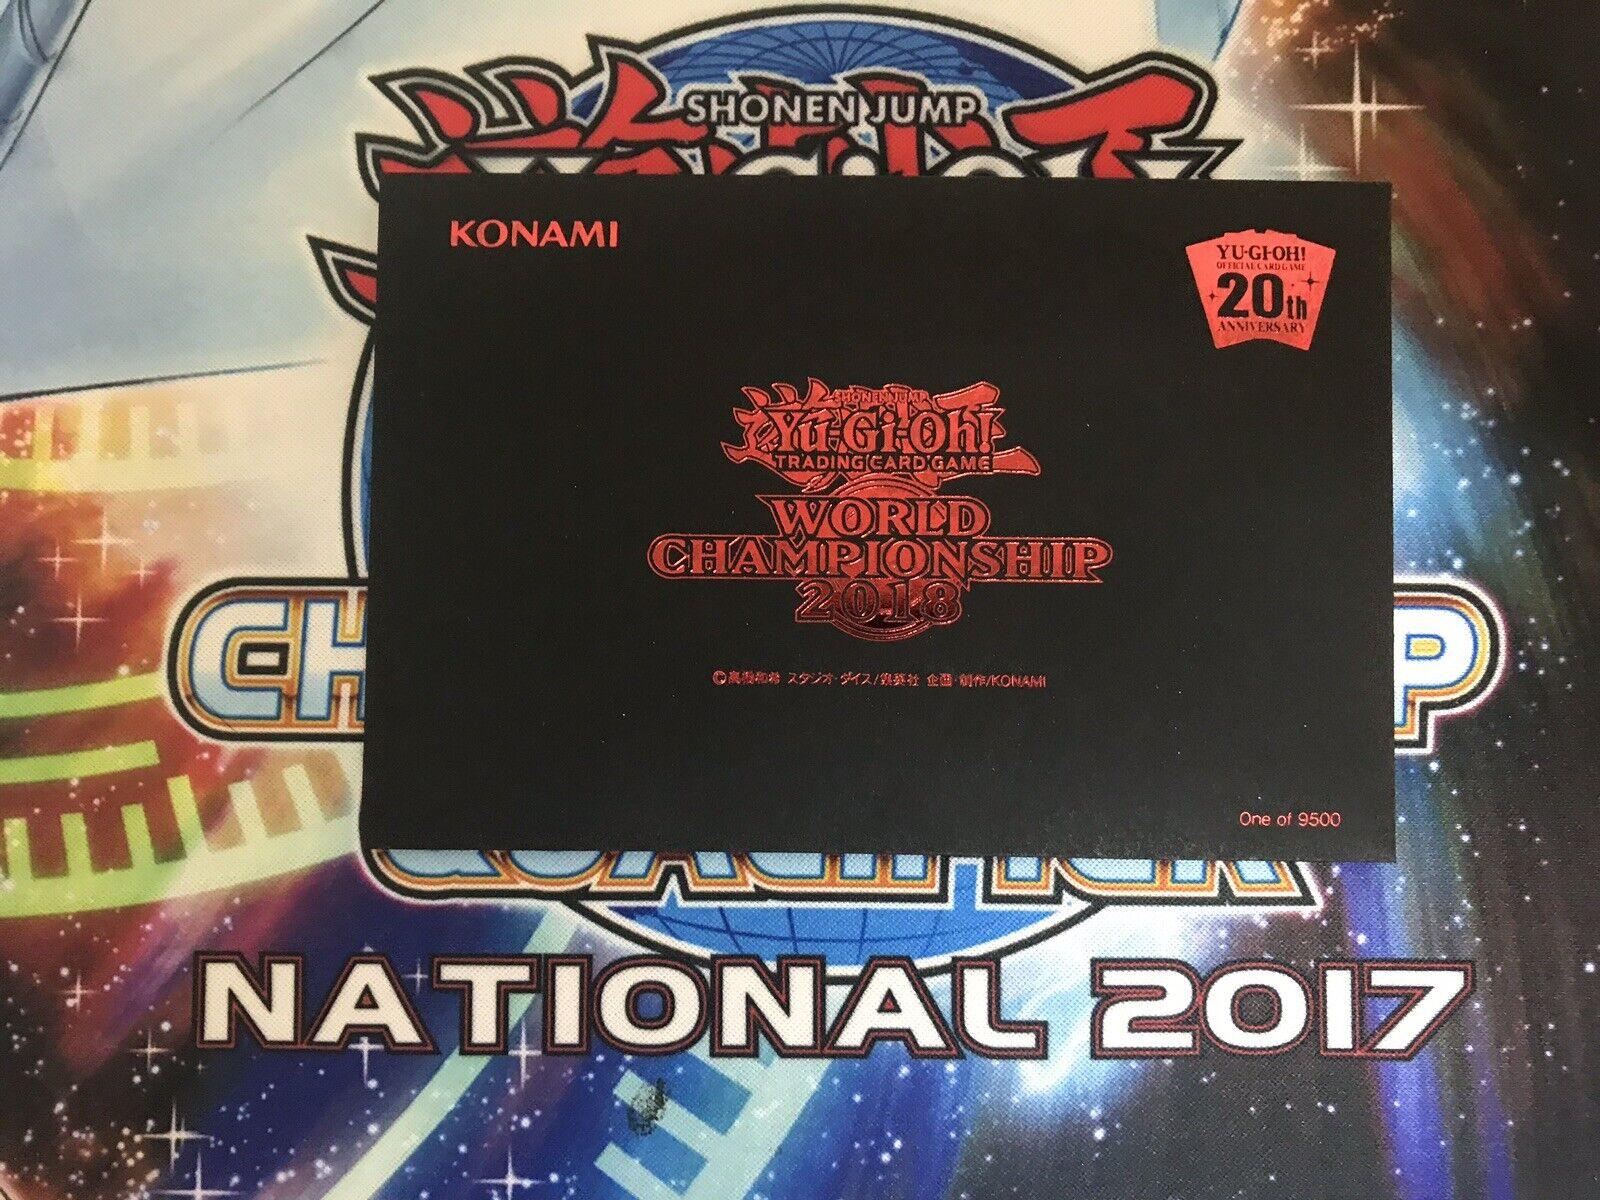 YUGIOH RARE WORLD CHAMPIONSHIP 2018 PRIZE PROMO PROMO PROMO CARDS blueE EYES DARK MAGICIAN 3f7517